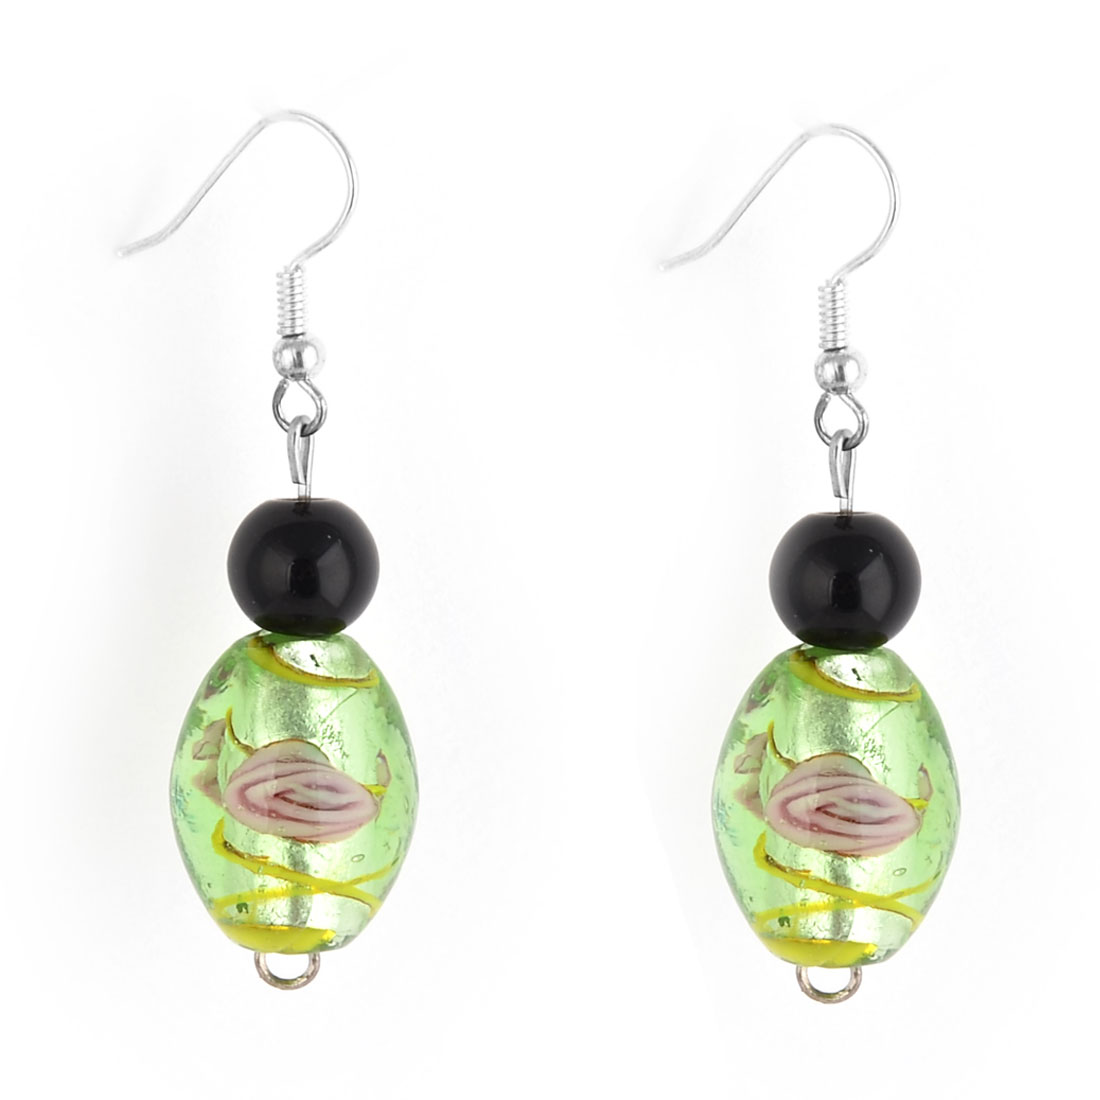 Travel Woman Glass Flower Print Jewelry Pendant Dangling Hook Earring Pair - image 2 de 2